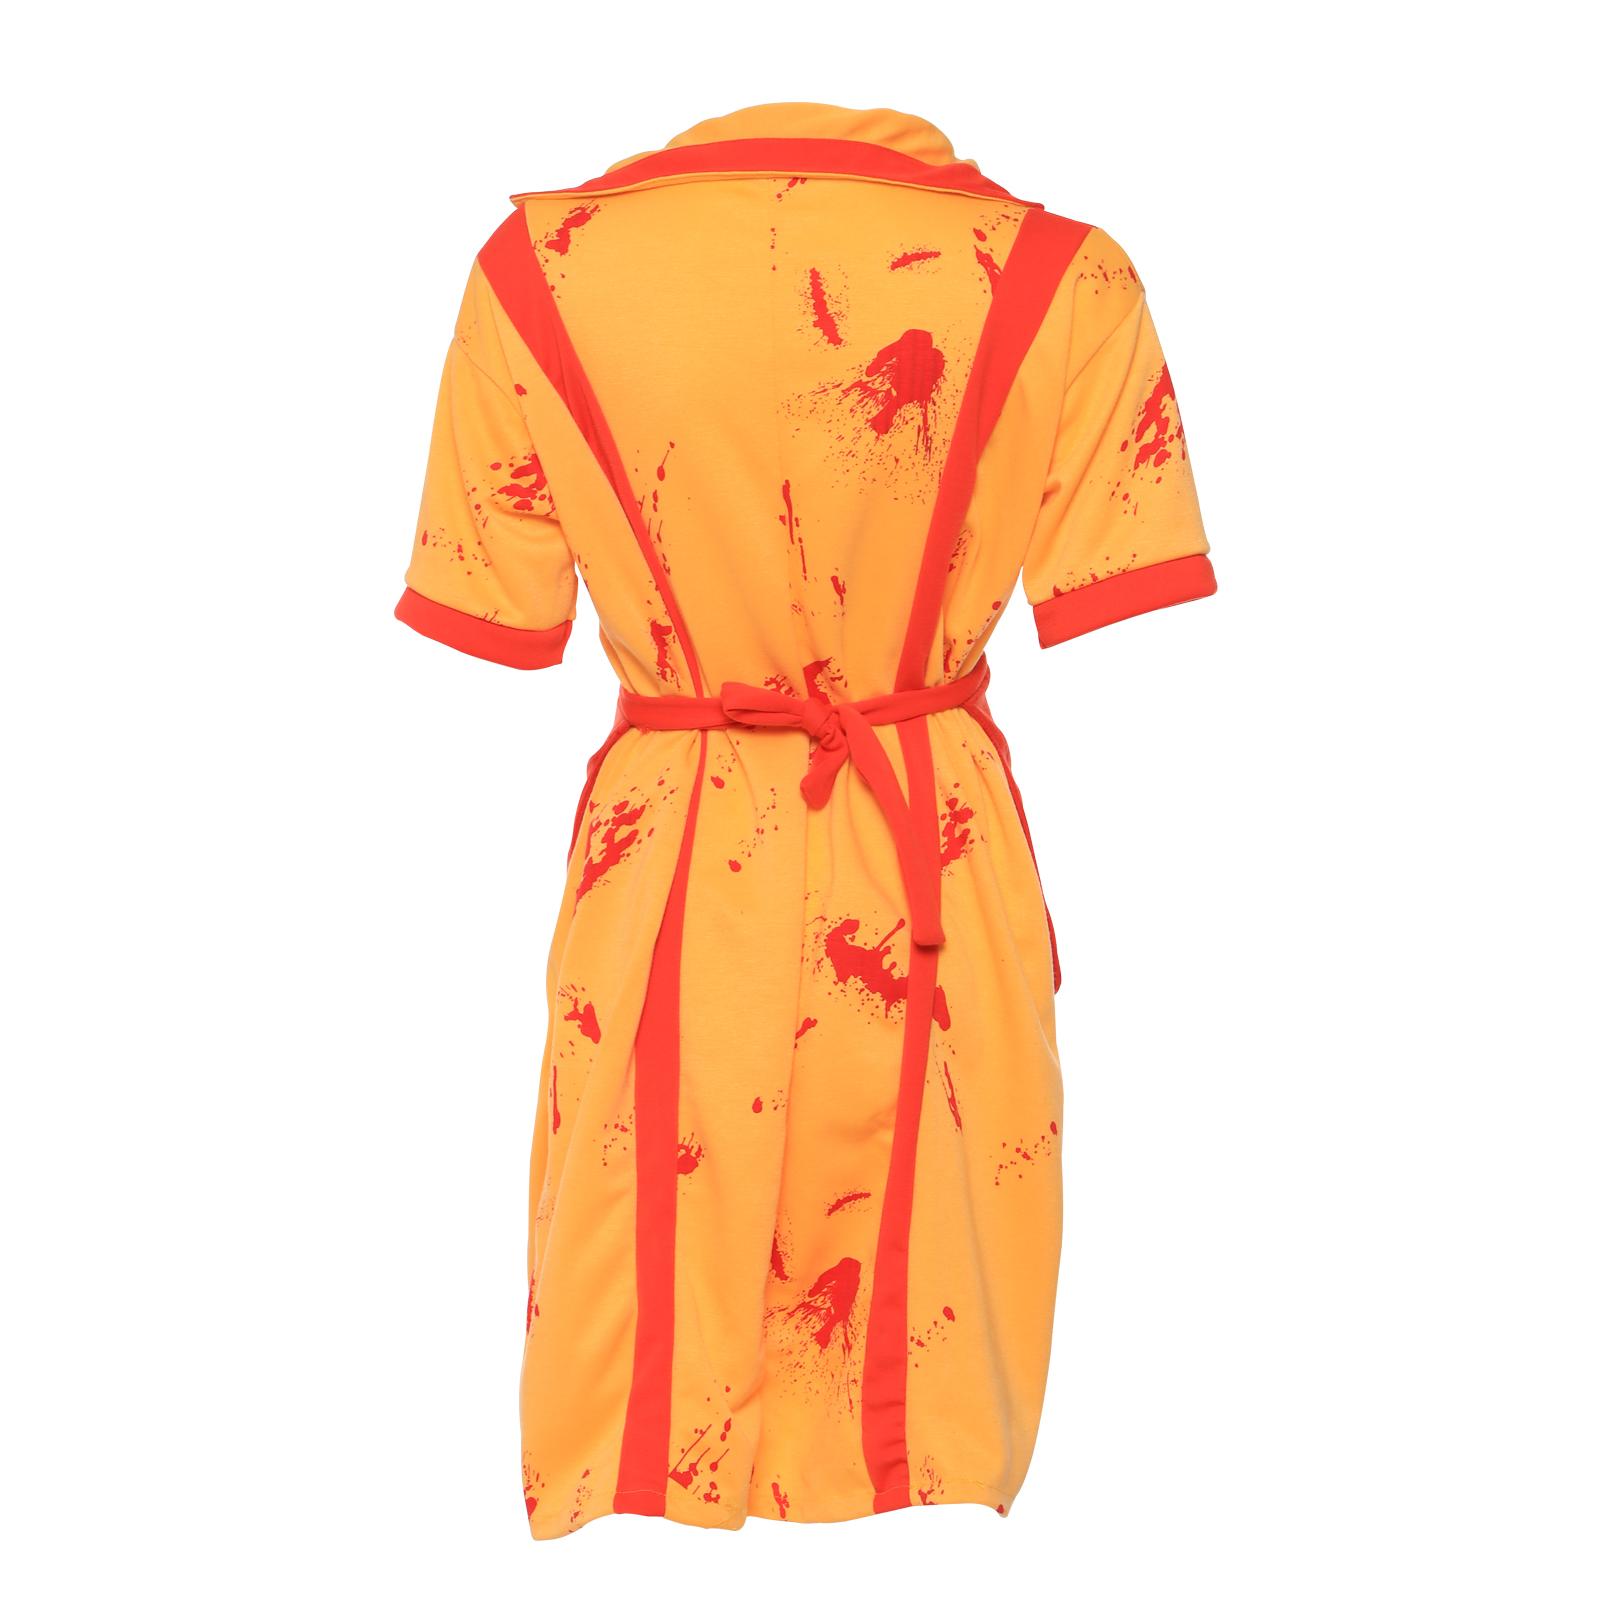 Broke Girls Waitress Fancy Dress Costume Zombie Maid Dress Full Outfits